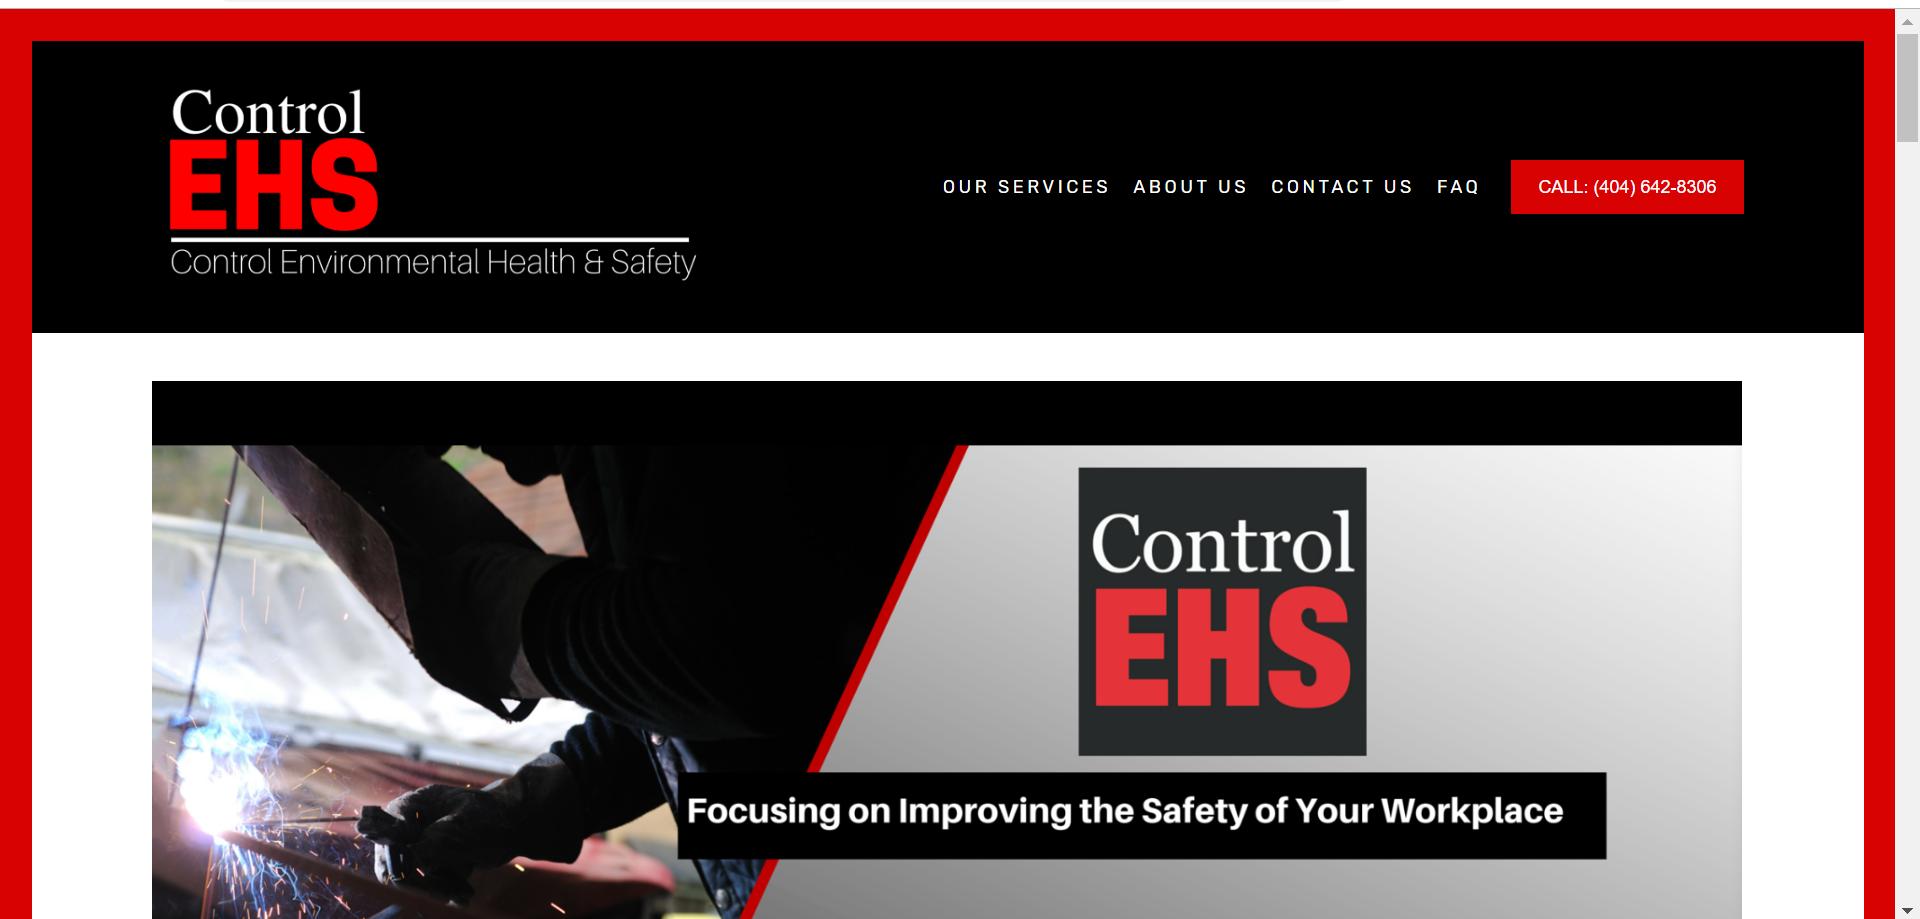 CONTROL EHS - INDUSTRIAL LEGAL SERVICES